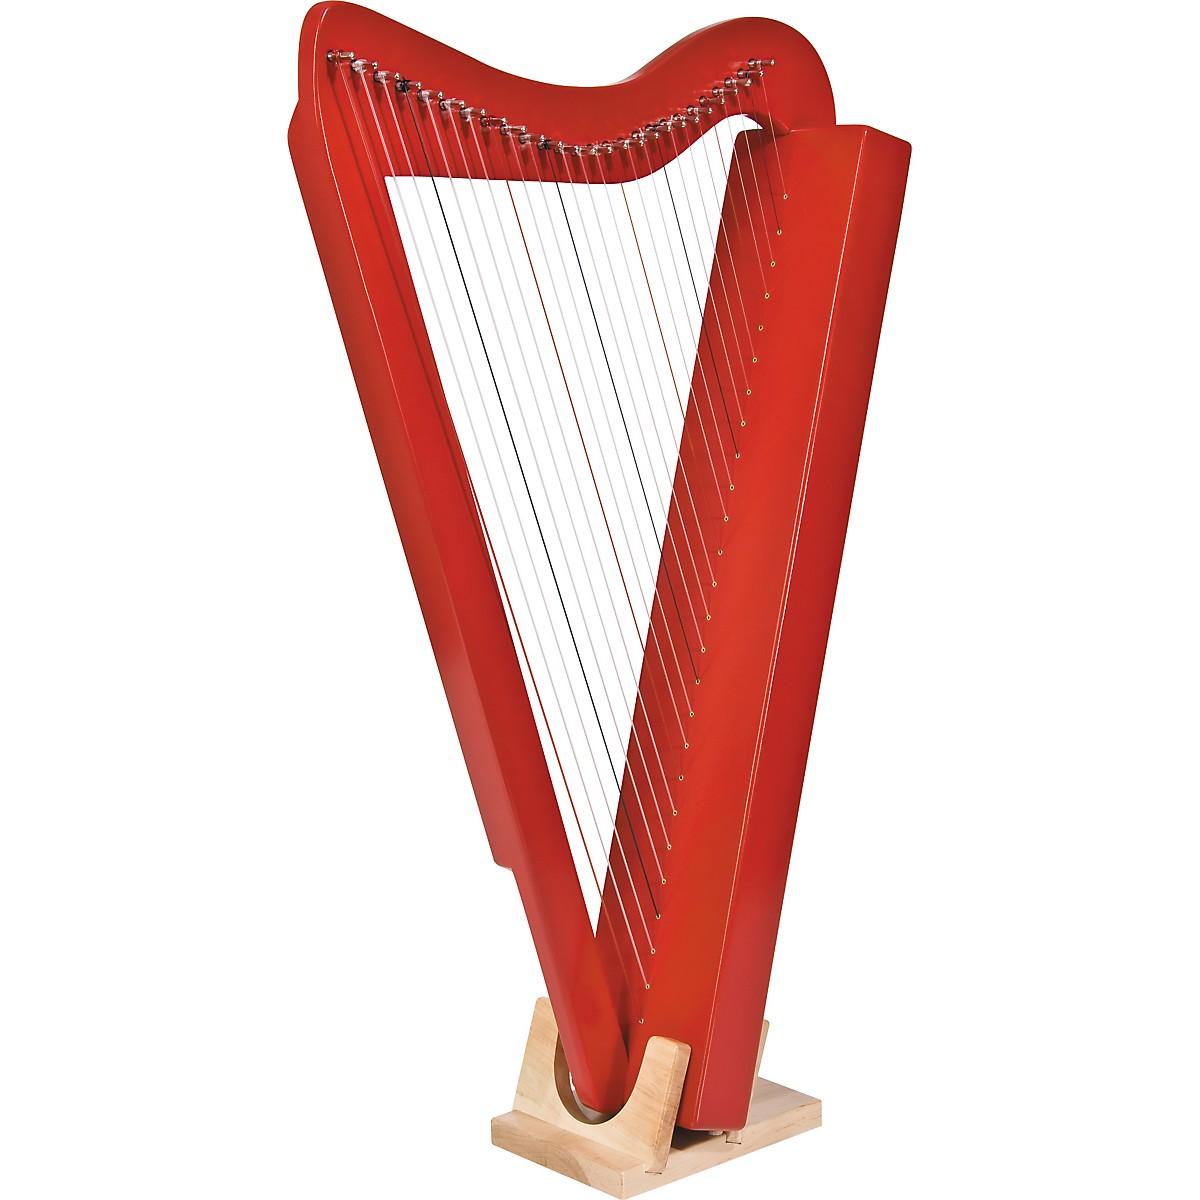 Rees Harps Harpsicle Harp